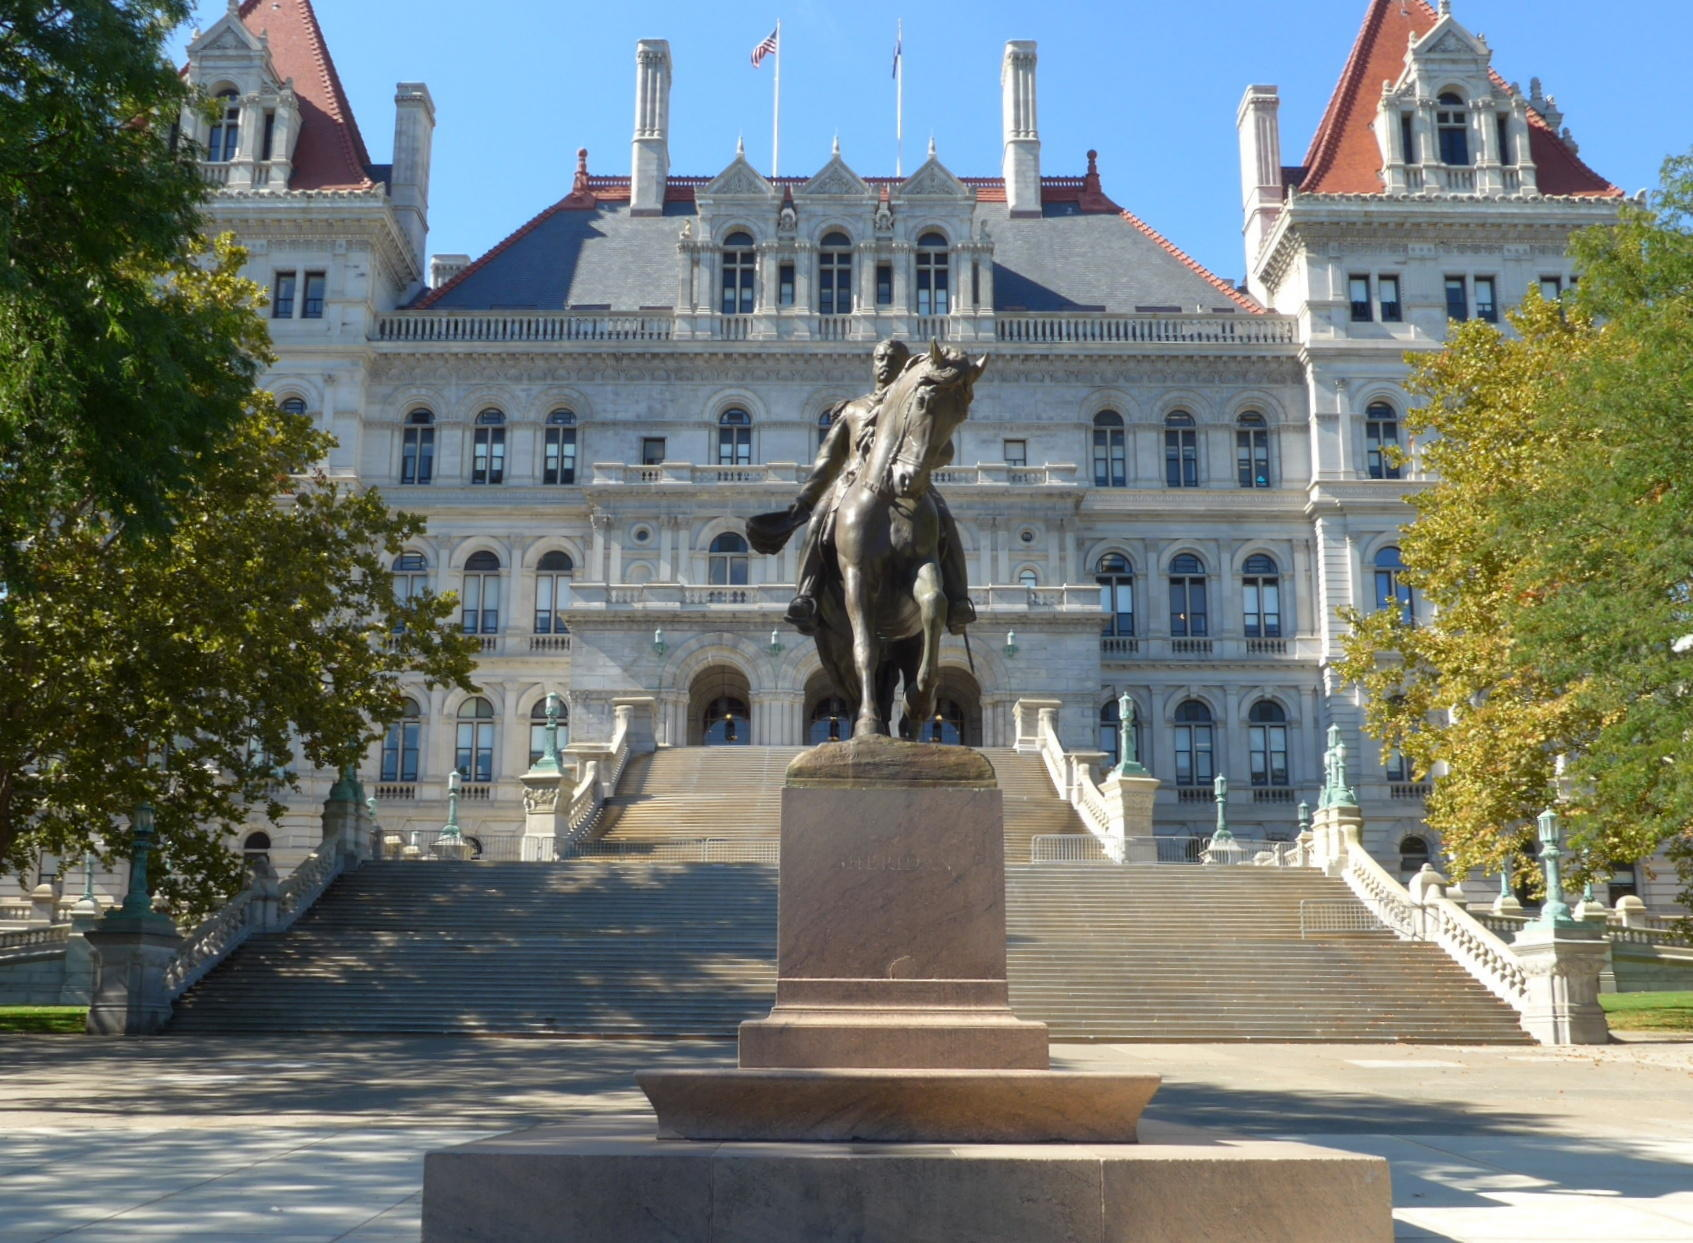 Cuomo Condemns House Tax Plan Wxxi News